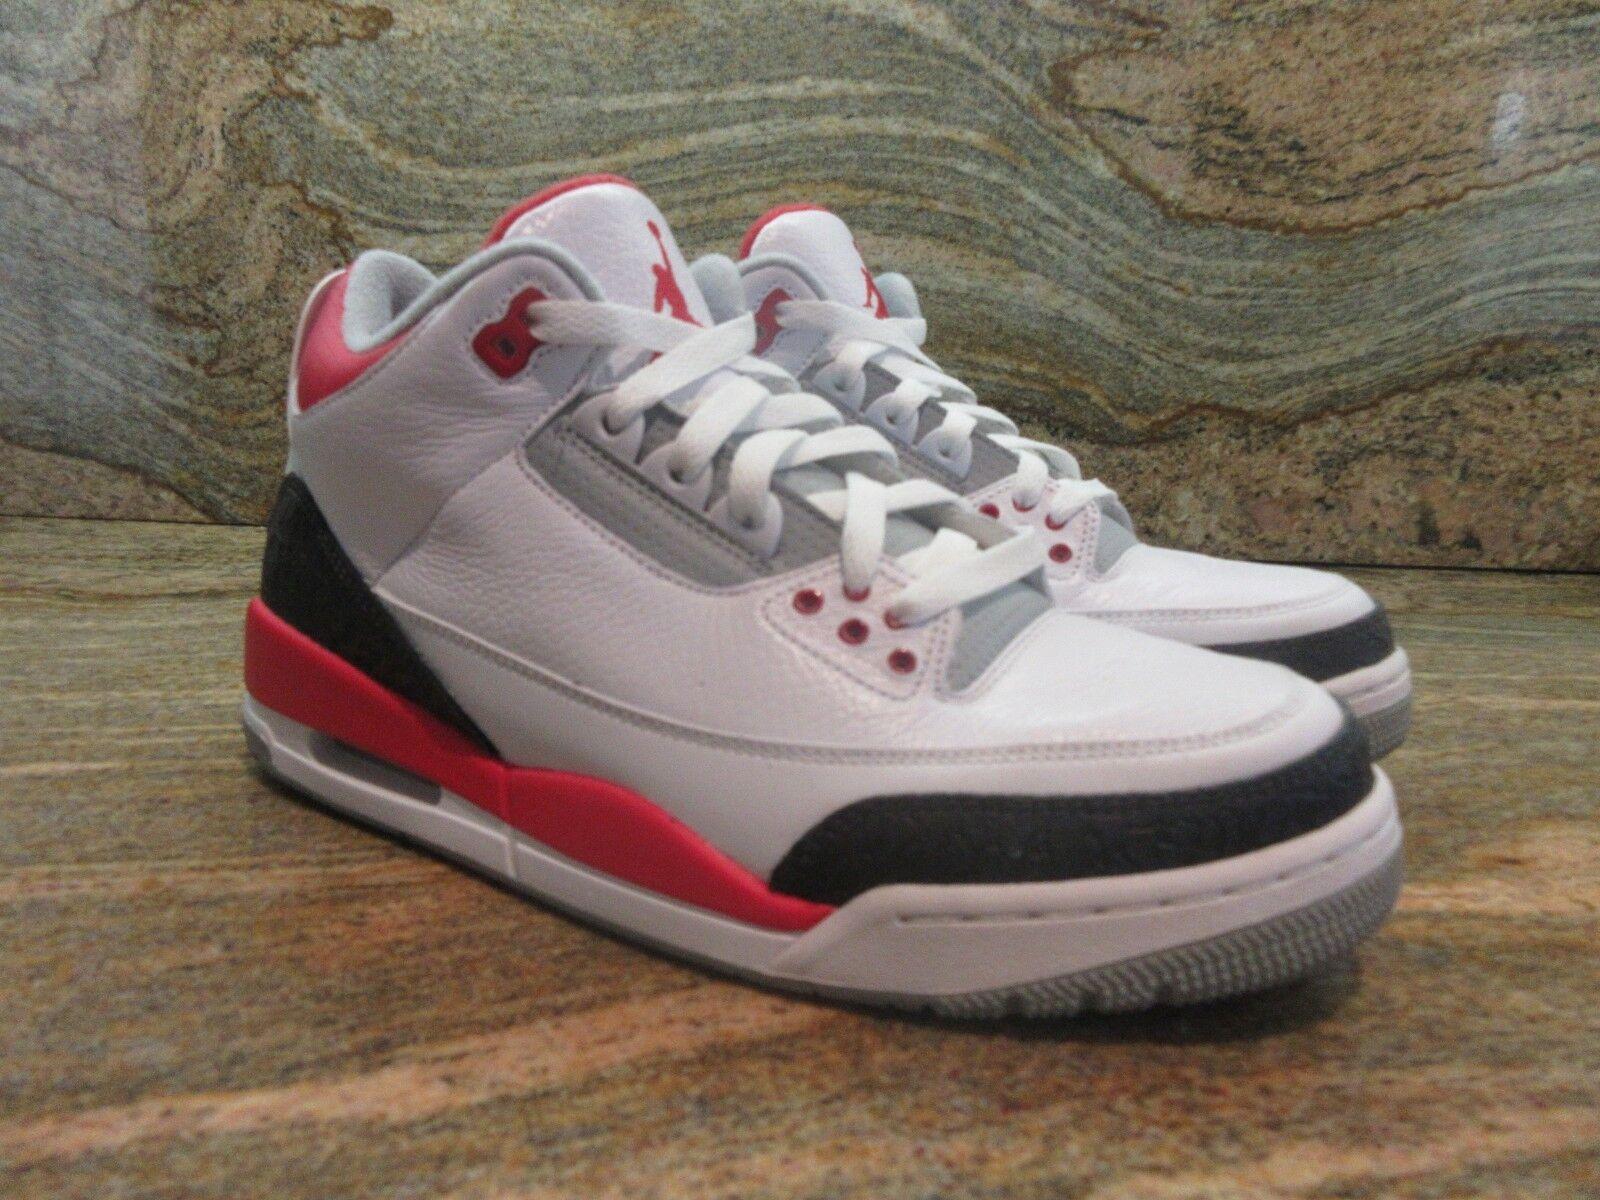 2018 Nike Retro Air Jordan 3 III Retro Nike 88 og rojo fuego Cemento Blanco 1360642018 e1a7d4